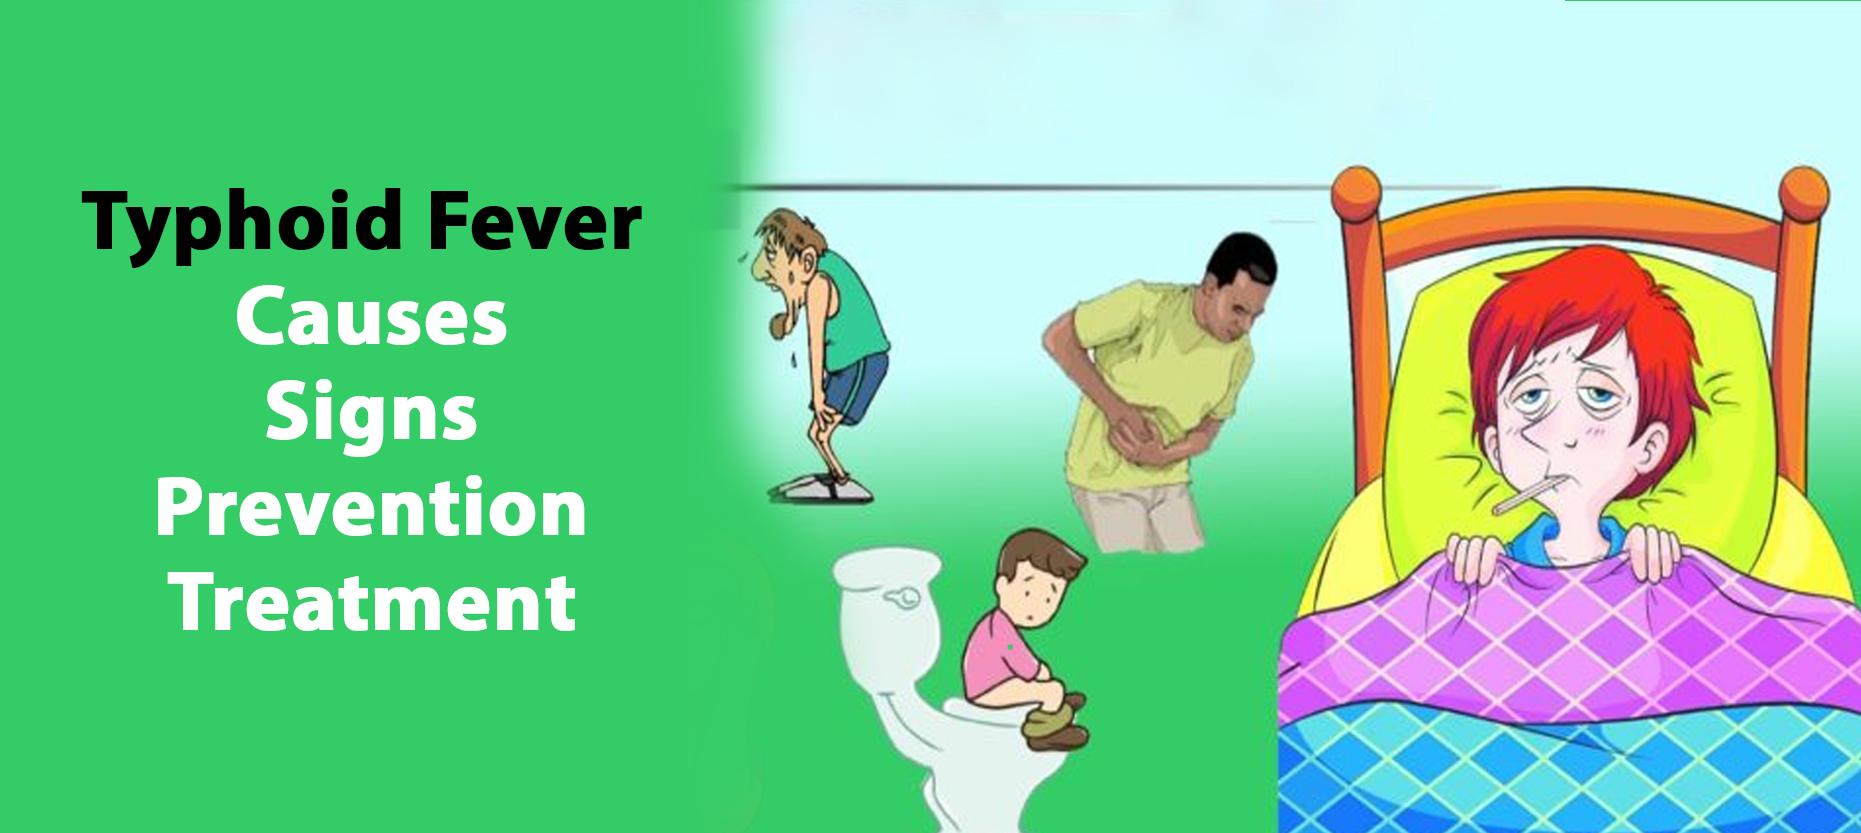 Typhoid Fever – Signs & Symptoms, Treatment, Precautions, Complications